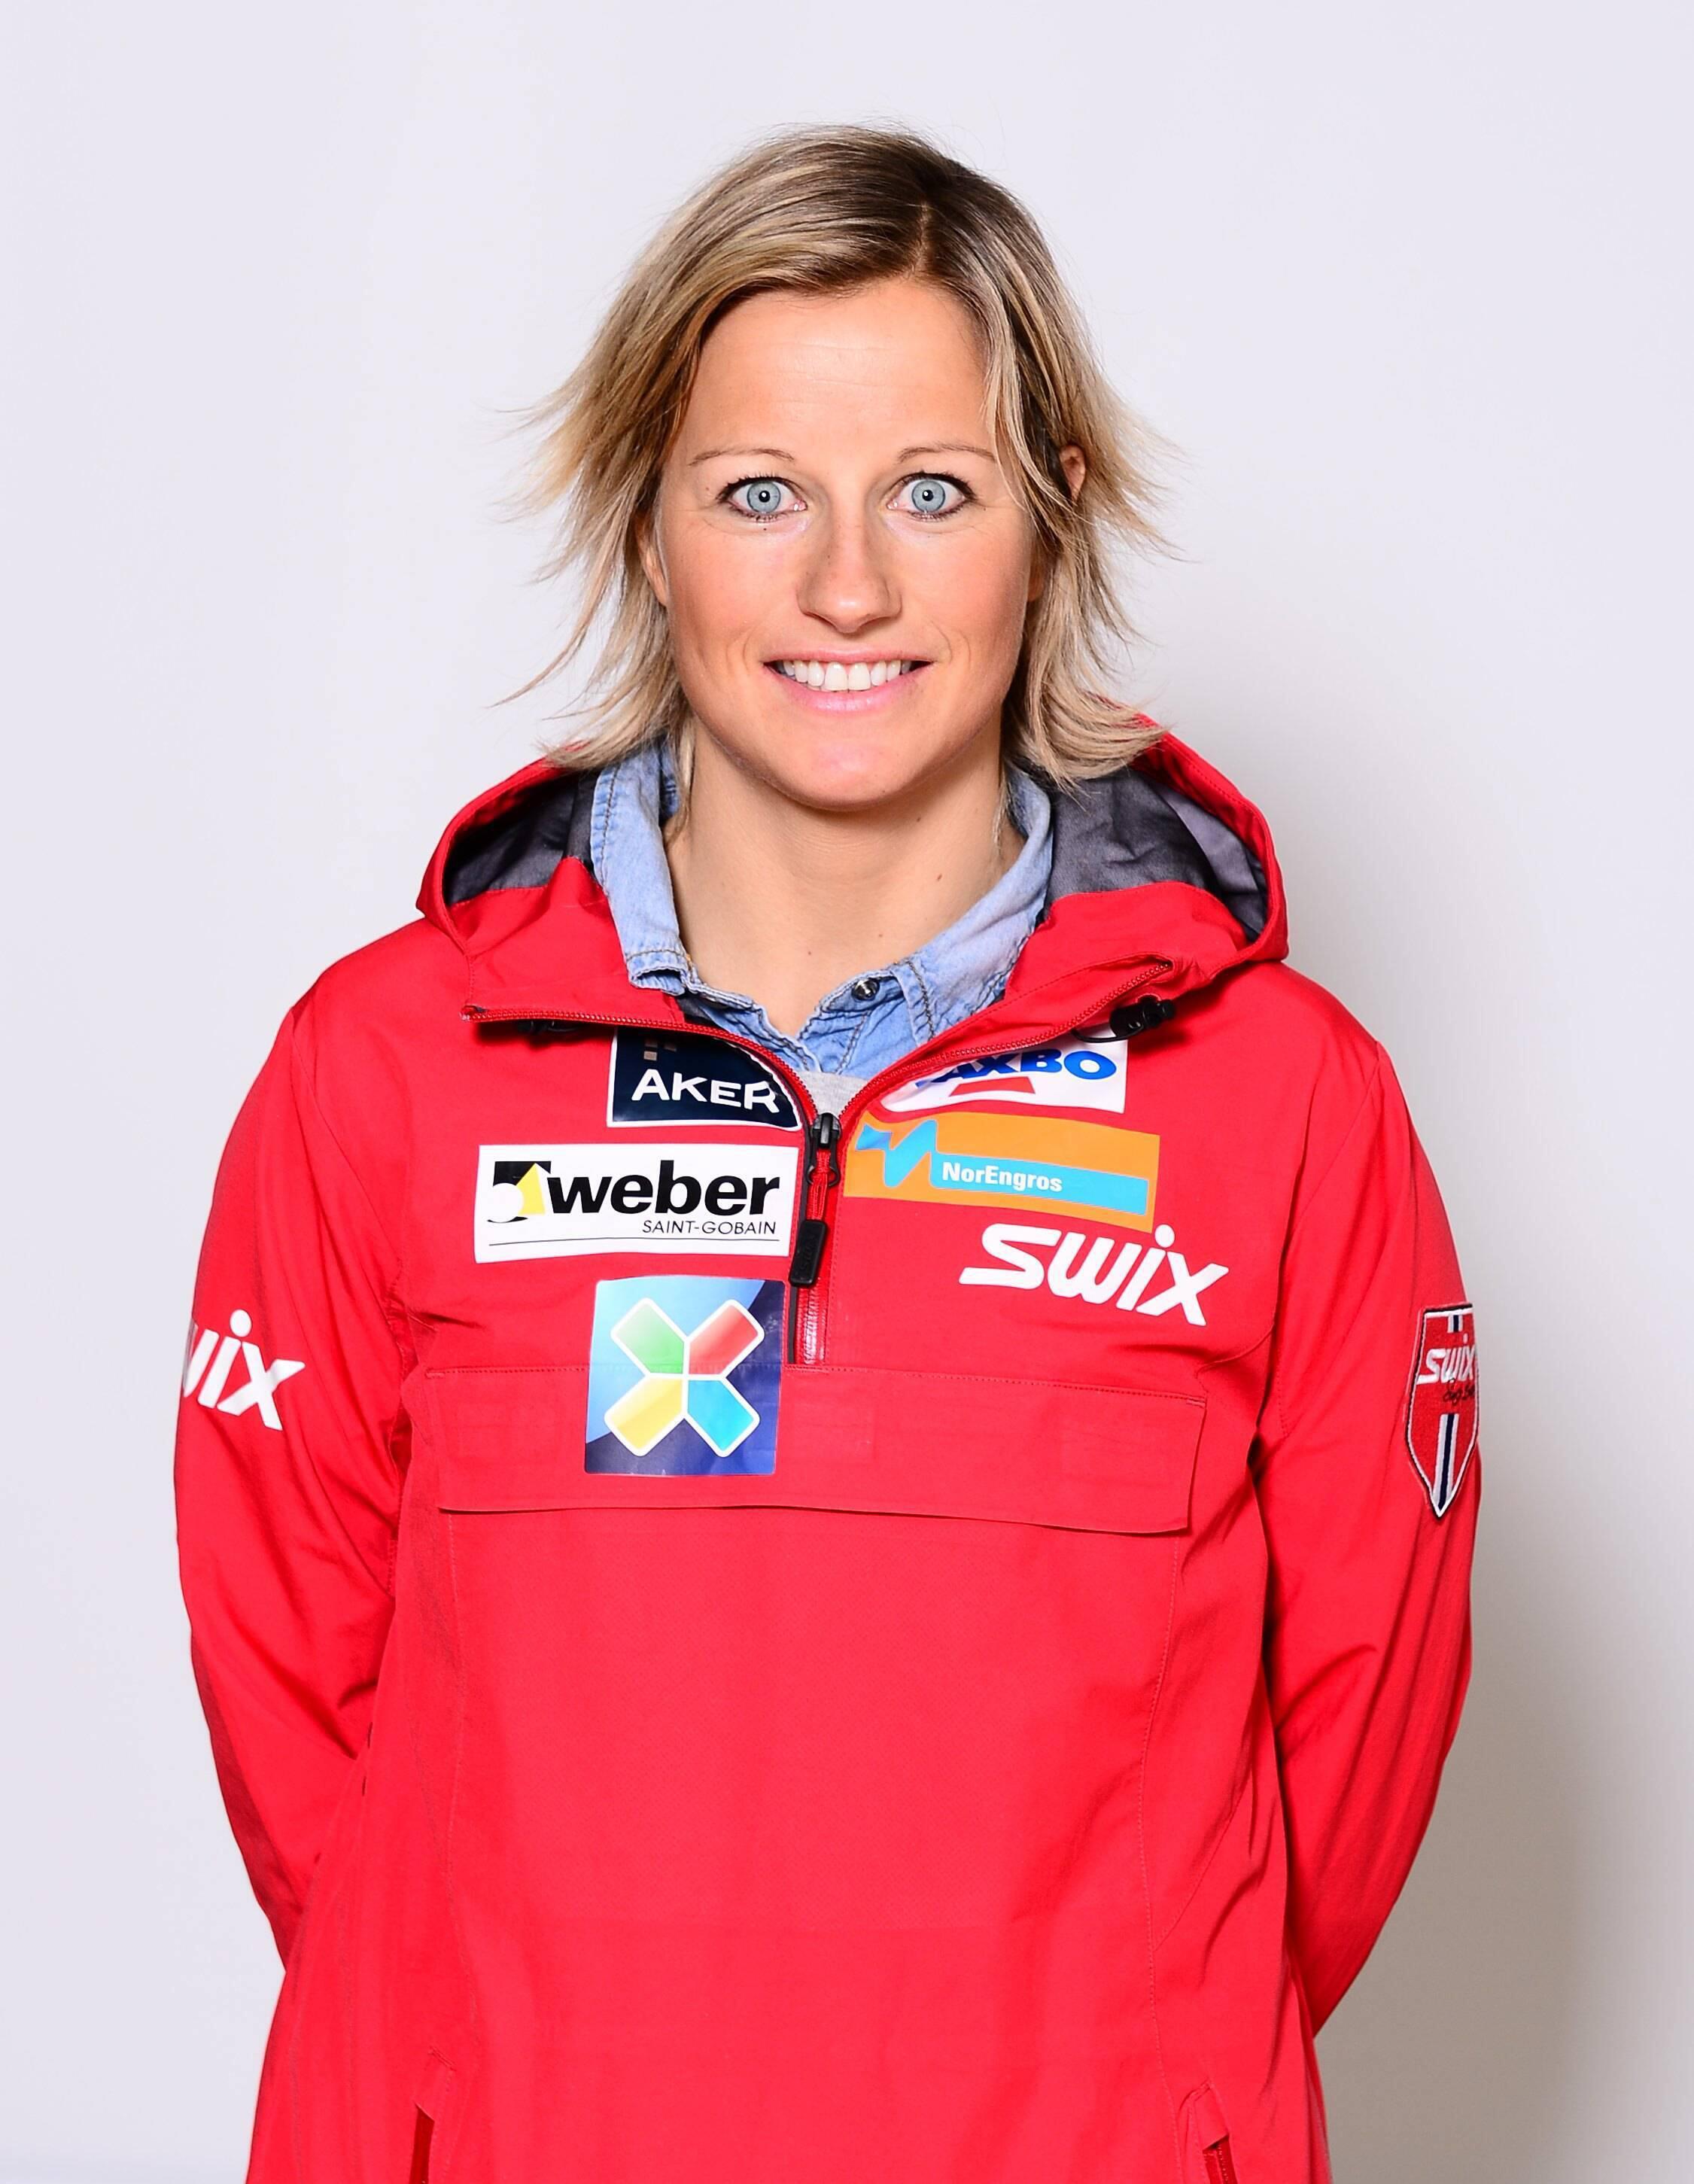 Bild zu Ski, Langläuferin, Vibeke Skofterud